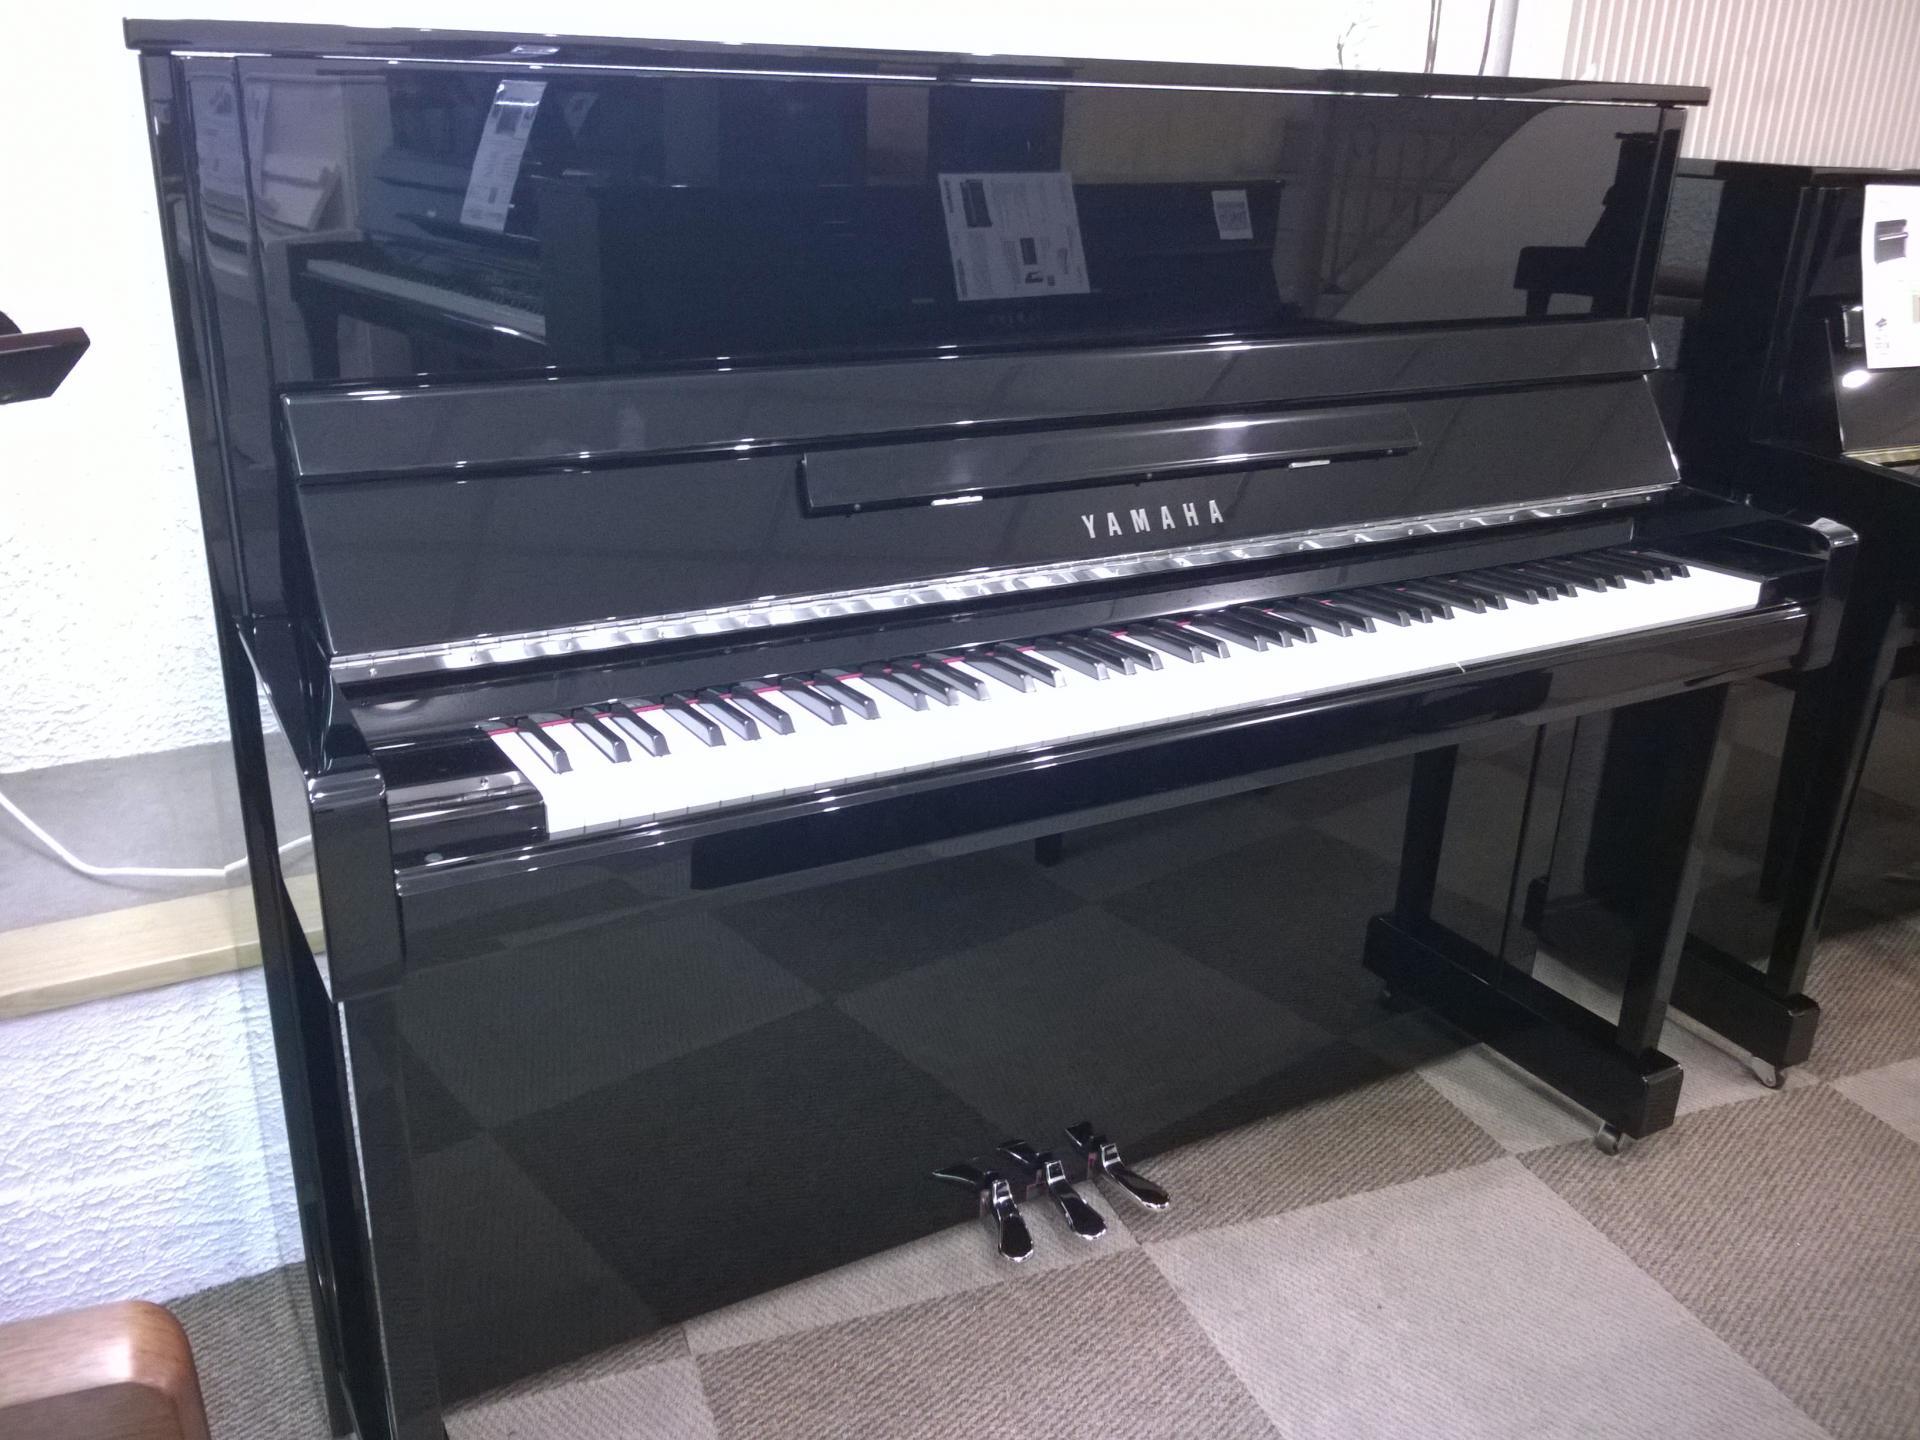 piano droit yamaha mod le b3epec noir brillant 121 cm chrom. Black Bedroom Furniture Sets. Home Design Ideas